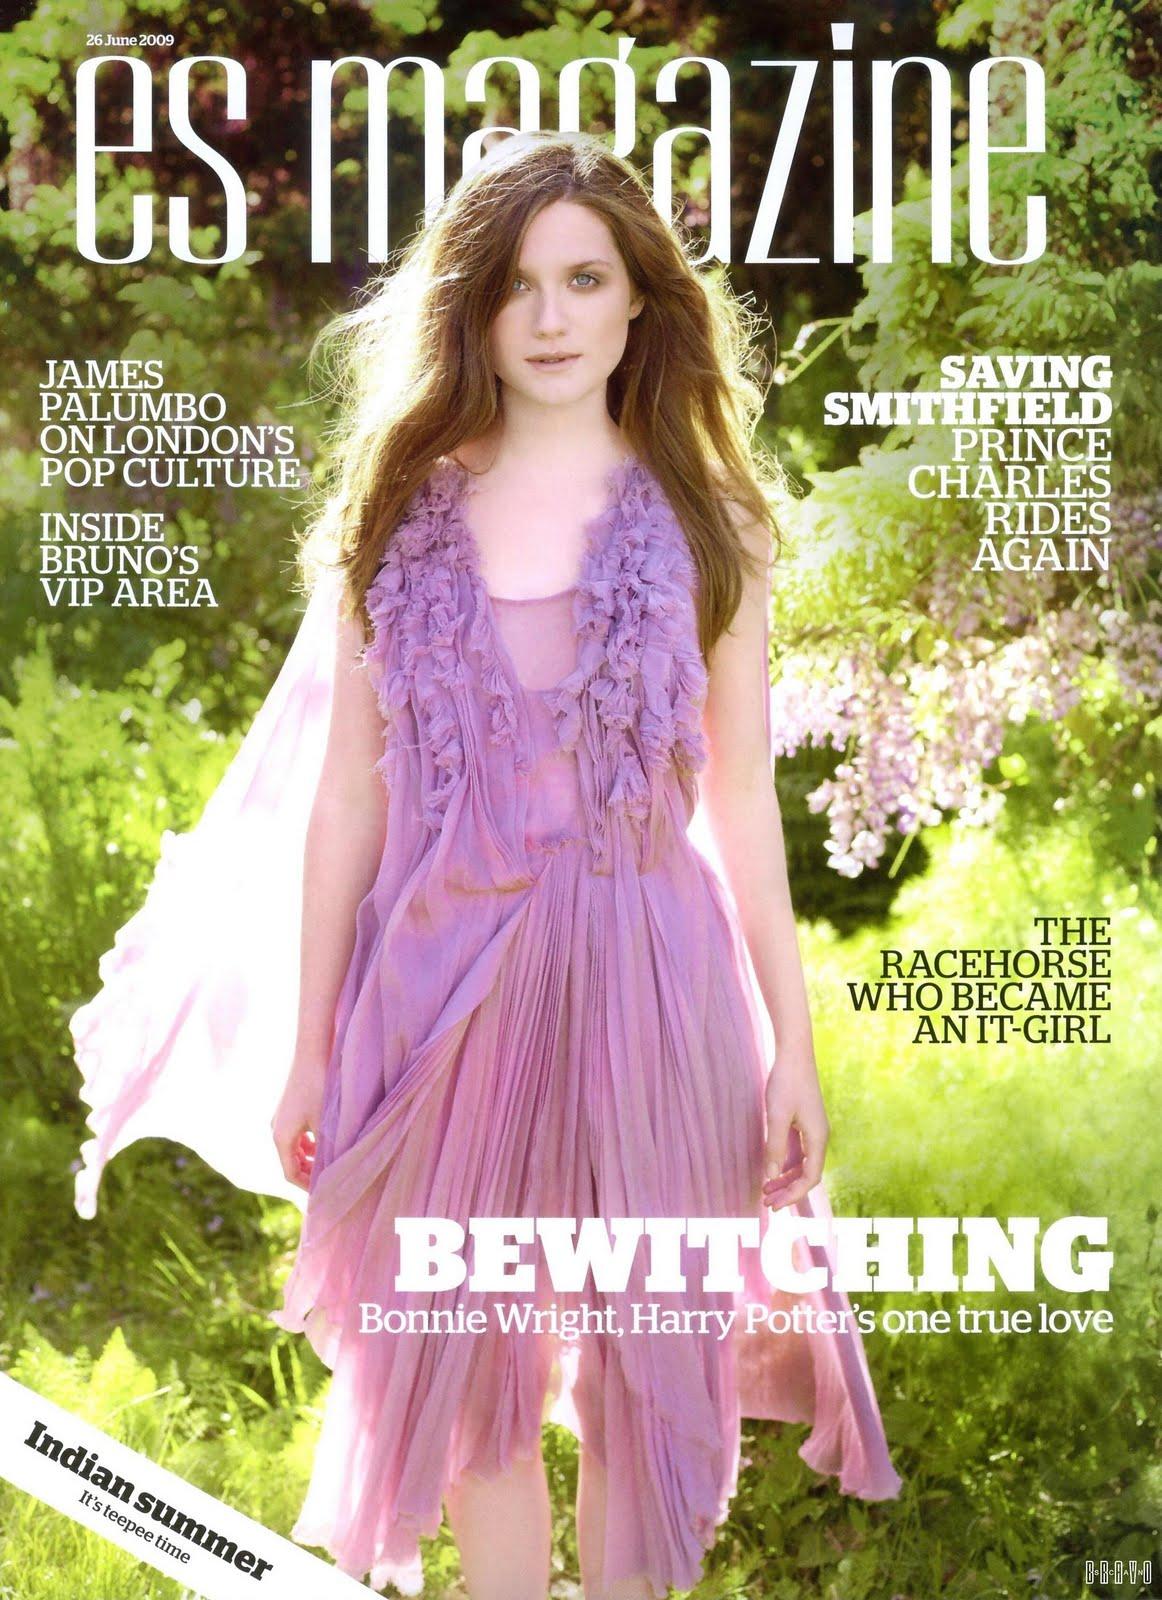 http://3.bp.blogspot.com/-mV9r5iiE0Yc/TagBU2PsM2I/AAAAAAAAA0Q/vjxXyj1ShdY/s1600/bonnie-wright-esmagazine-2009-2.jpg